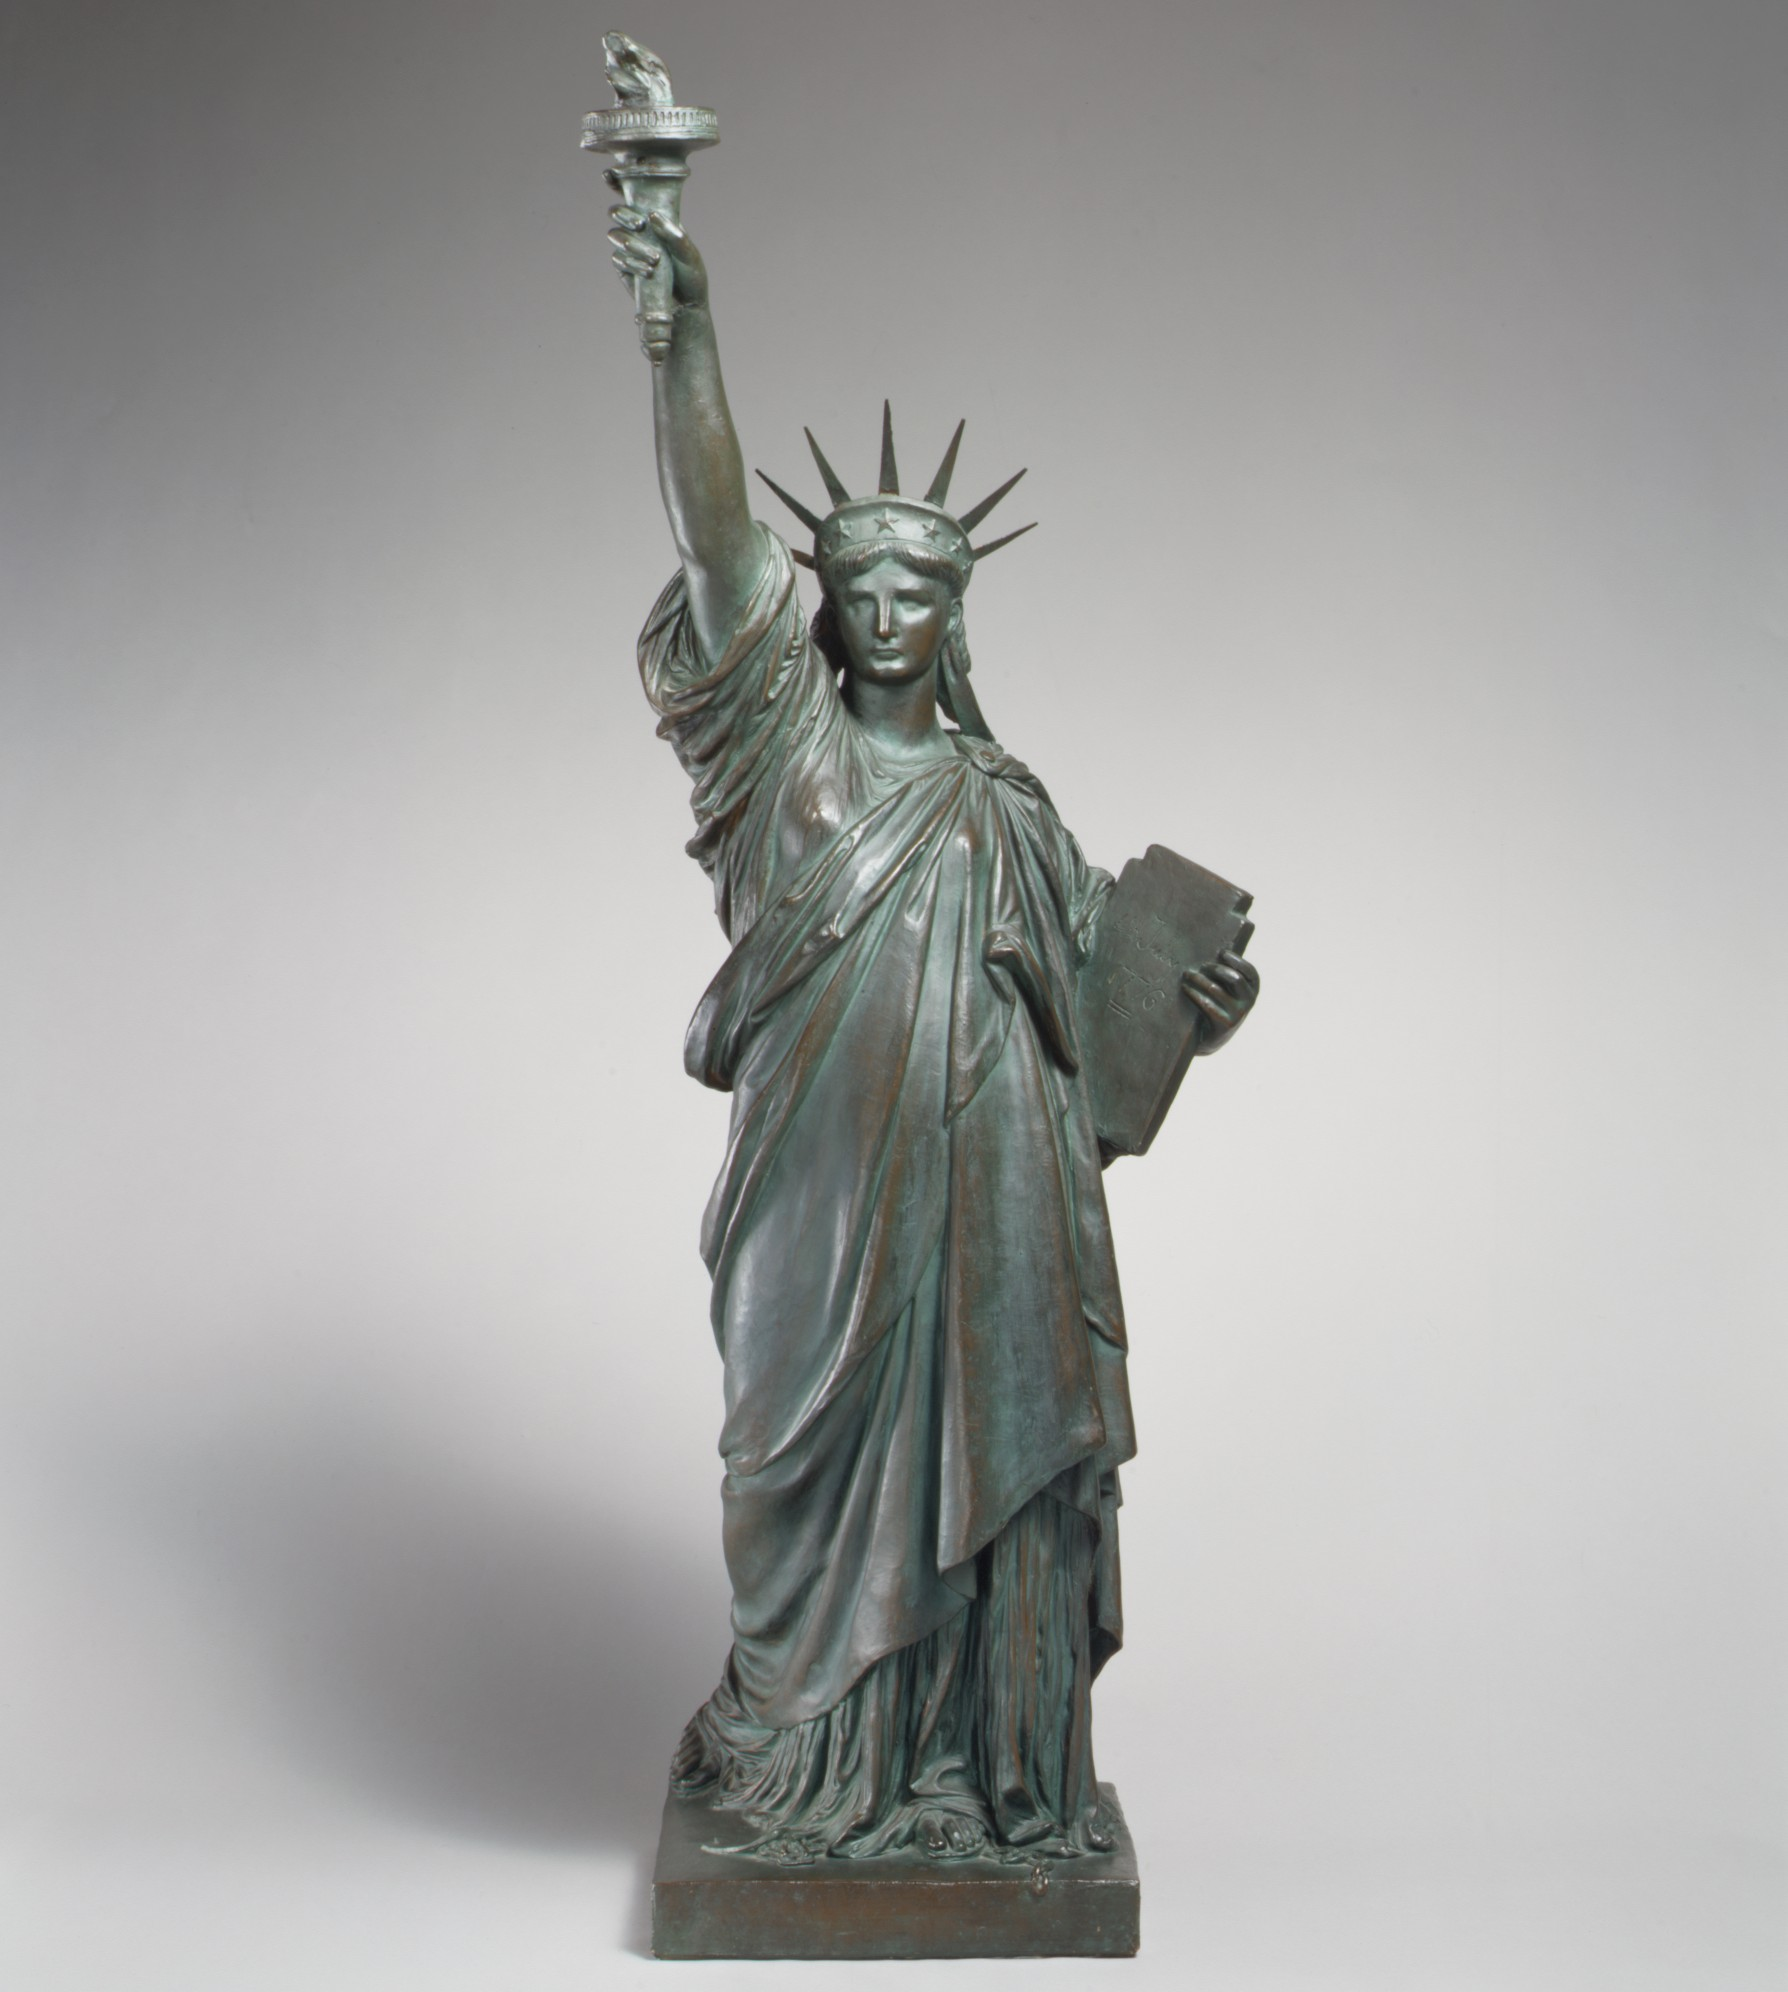 statue of liberty replica, the met